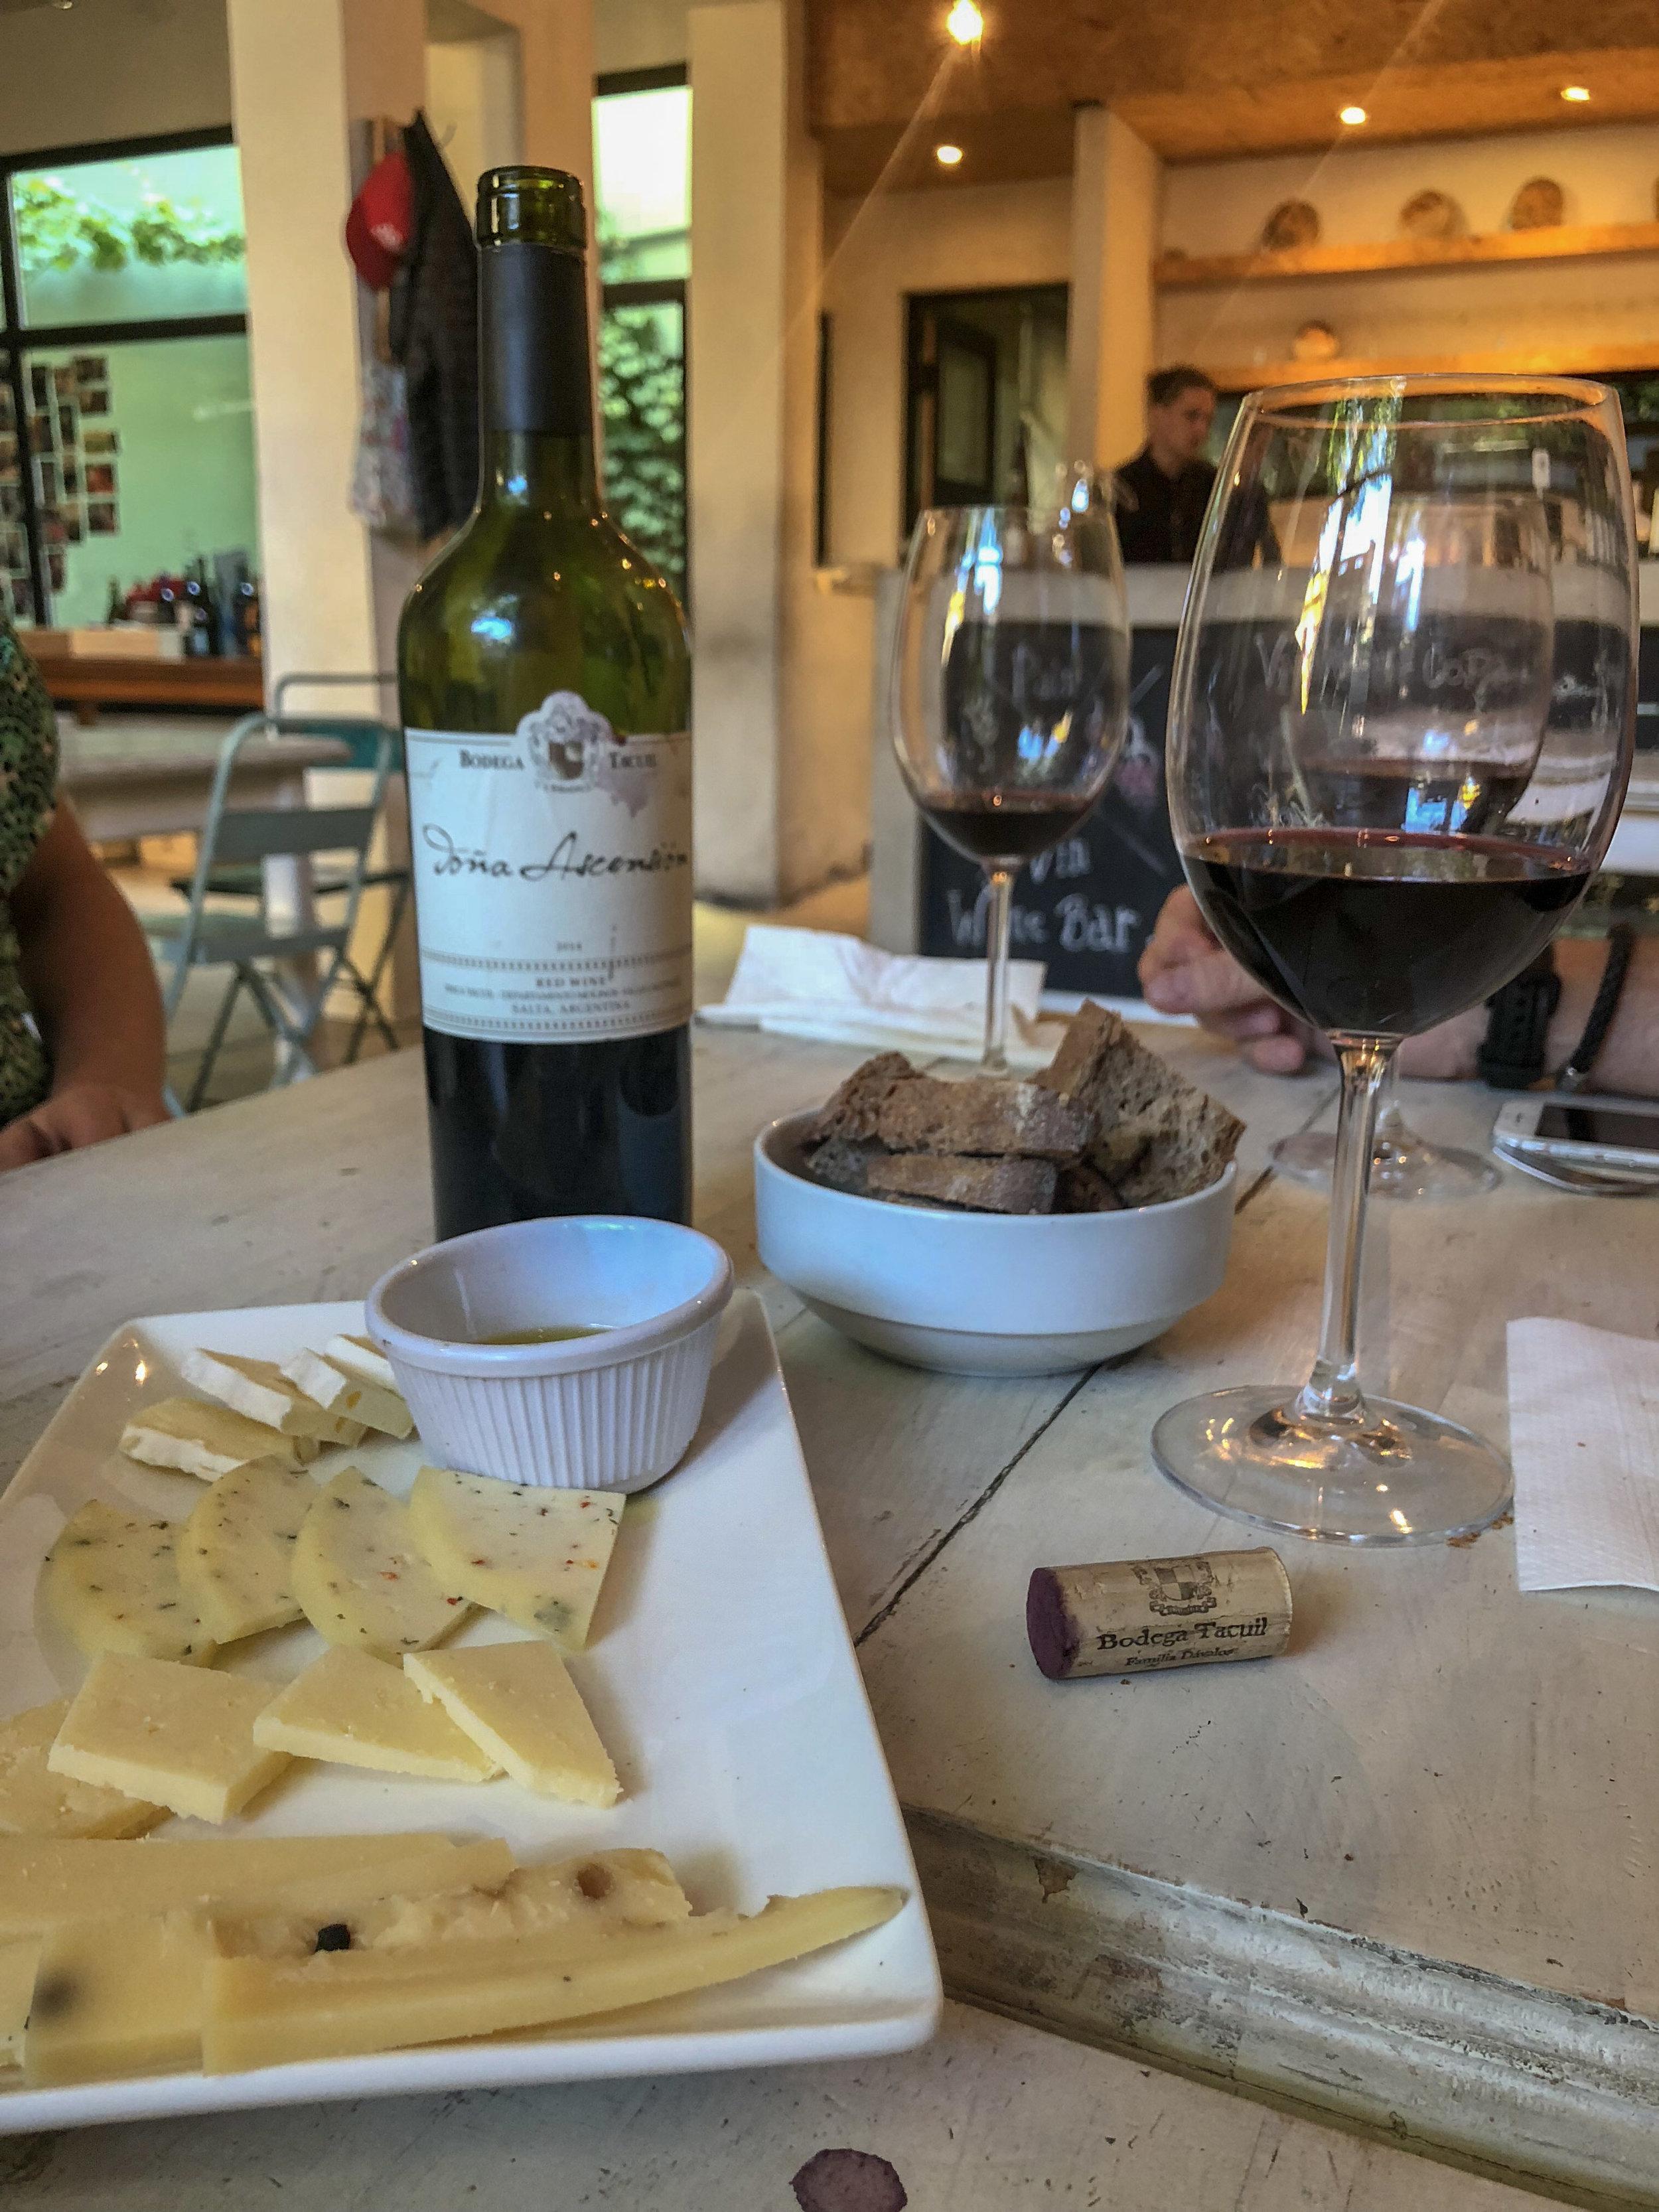 Pan et Vin, Palermo Soho